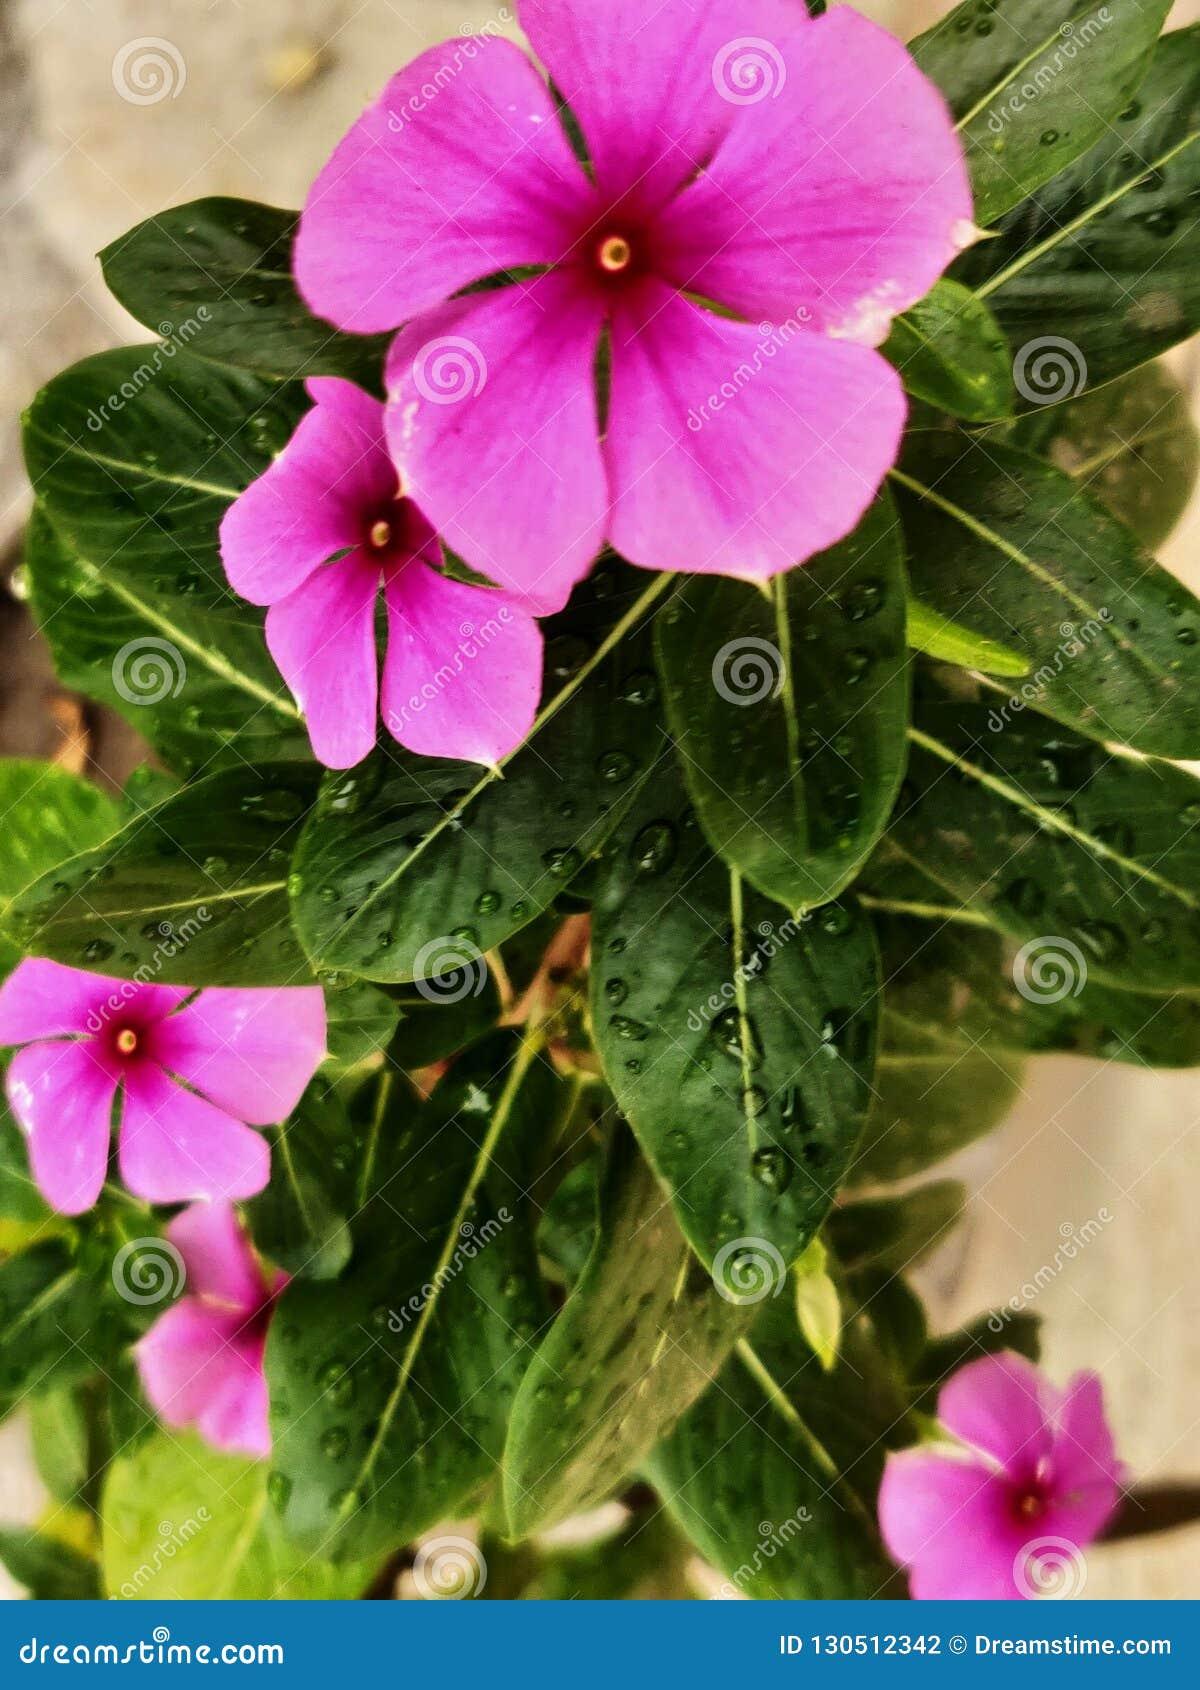 Madagascar Periwinkle Plant With Flowers Stock Photo - Image ...